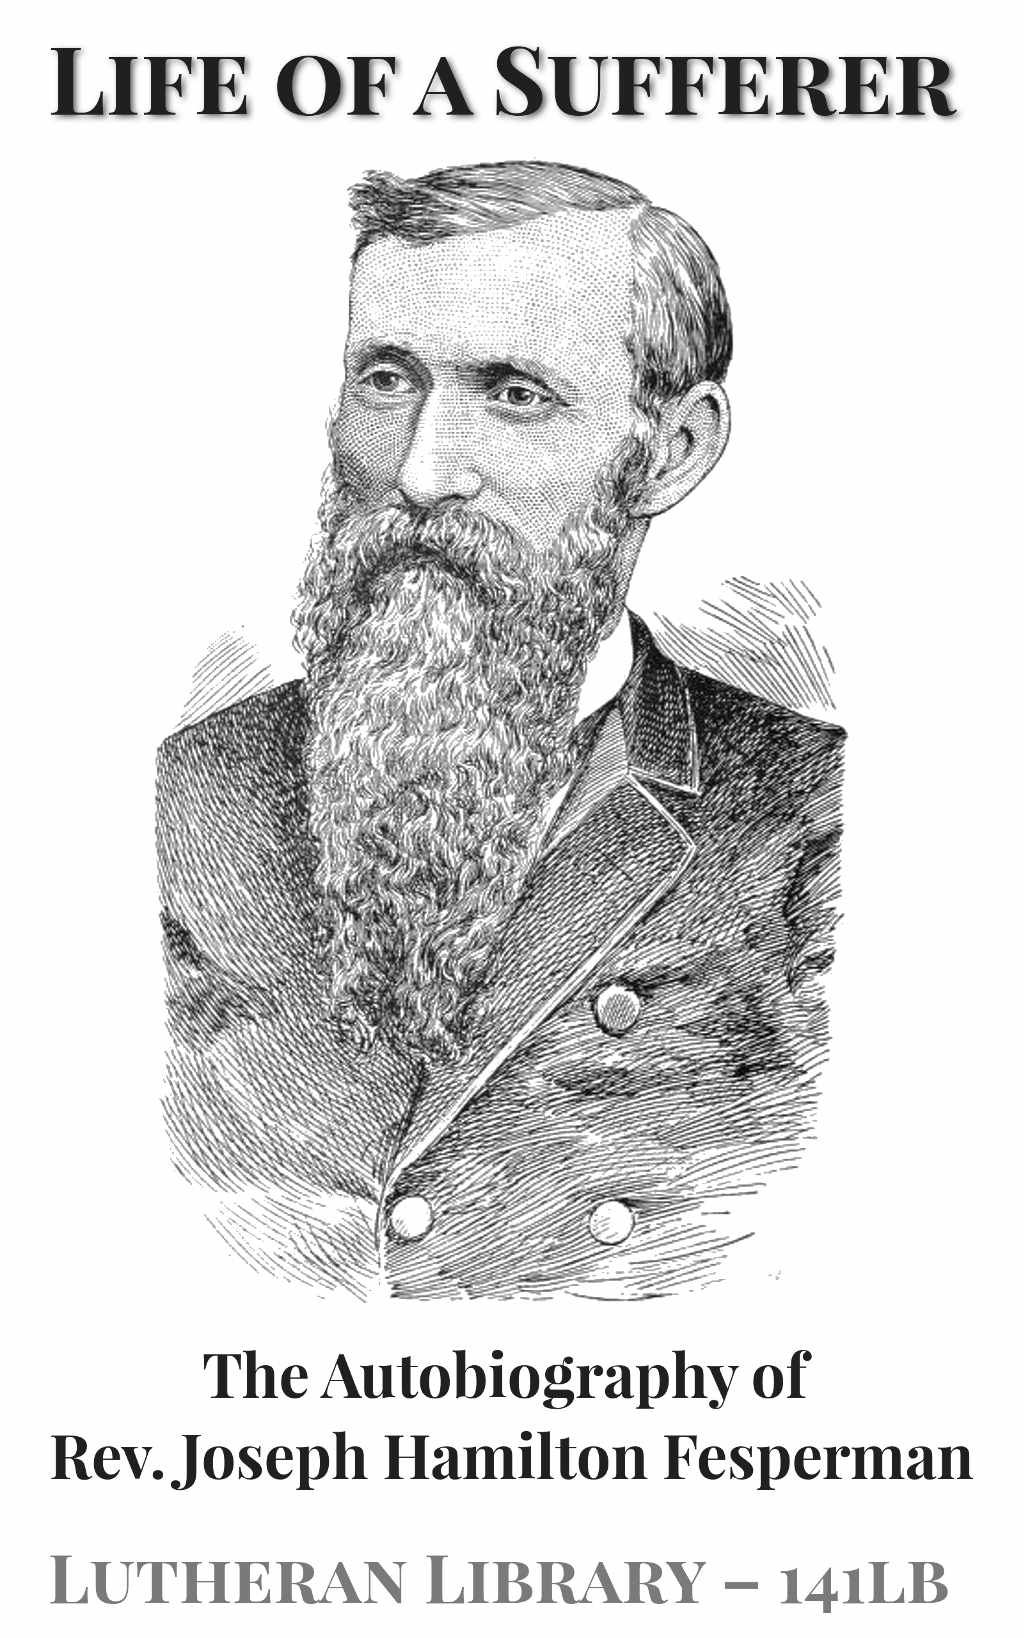 Life of a Sufferer - The Autobiography of Rev. Joseph Hamilton Fesperman